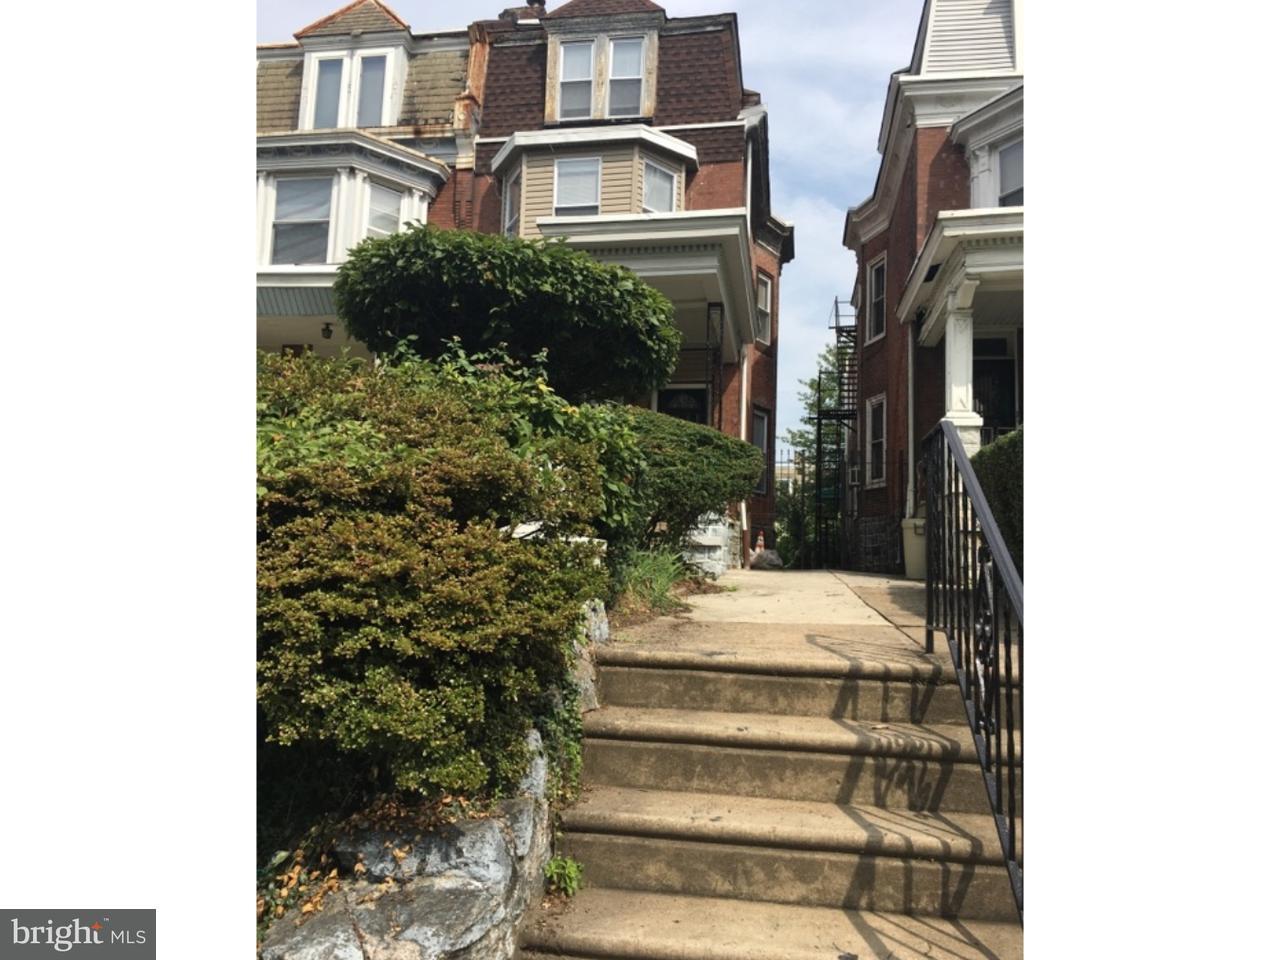 5337  Baltimore Philadelphia, PA 19143